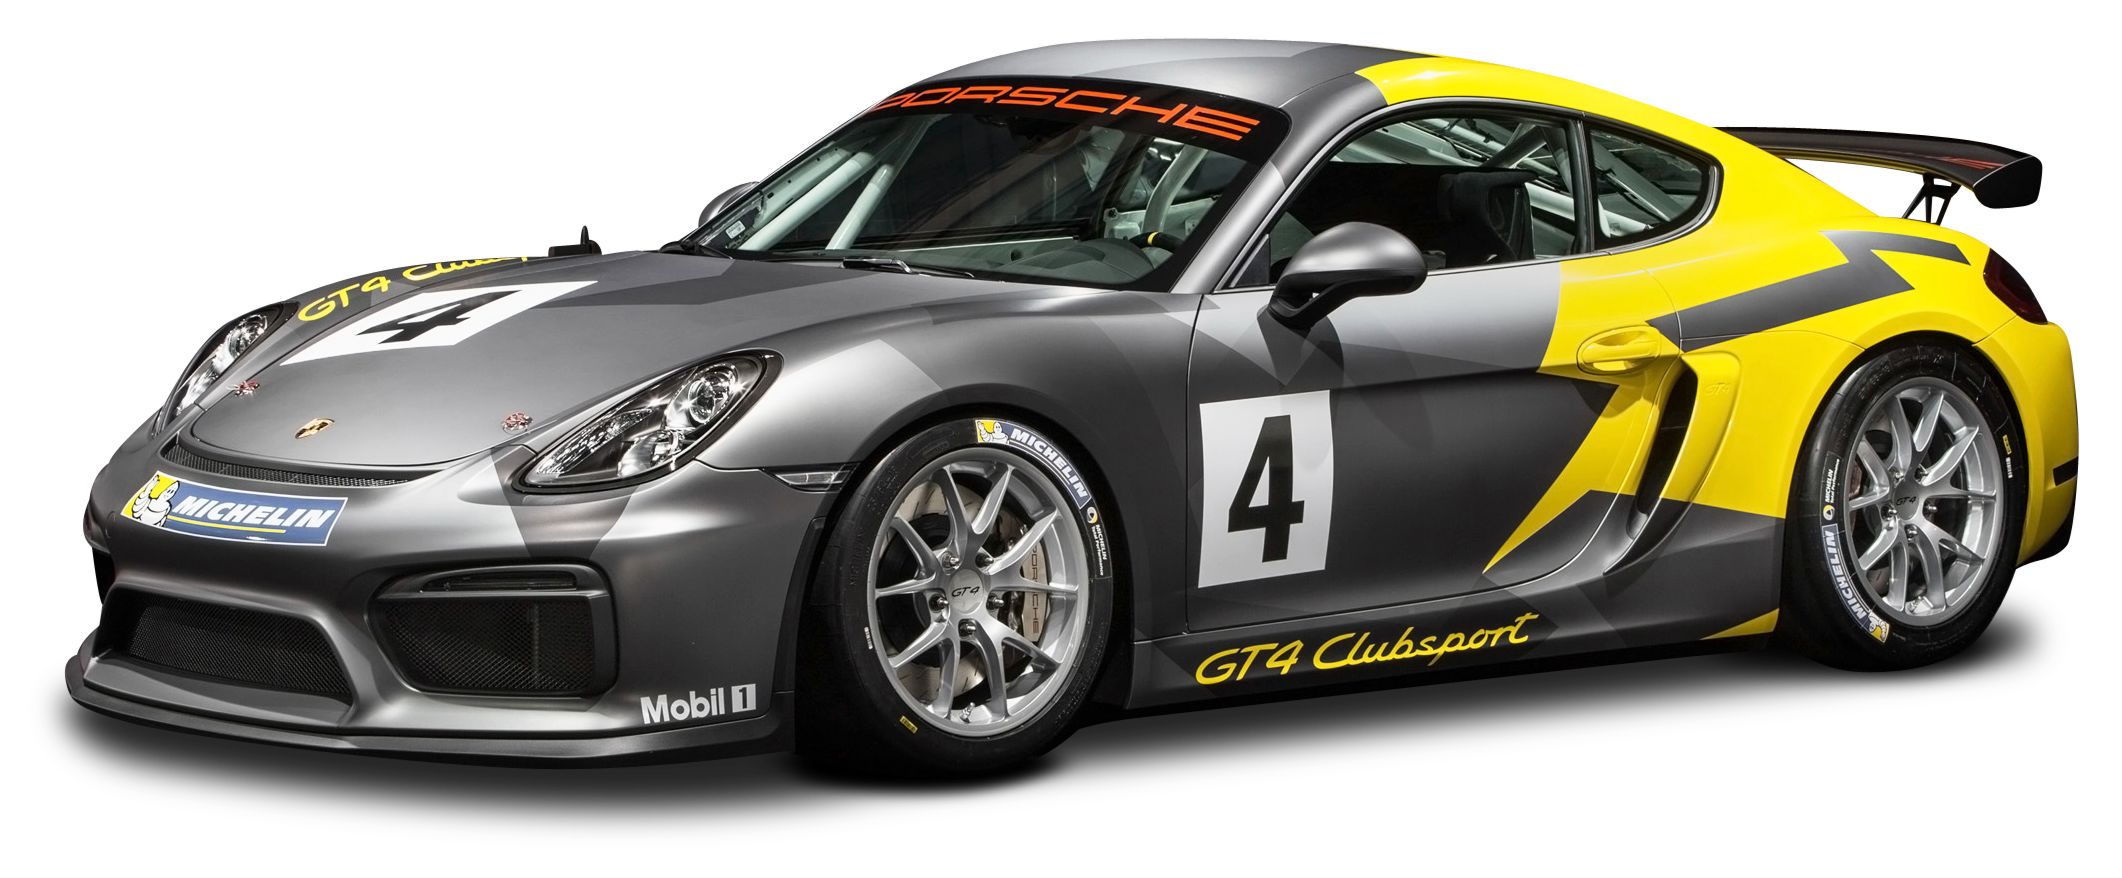 PNGPIX-COM-Porsche-Cayman-GT4-Clubsport-Racing-Car-PNG-Image.png (2122×878)  | Coches | Pinterest - Porsche HD PNG